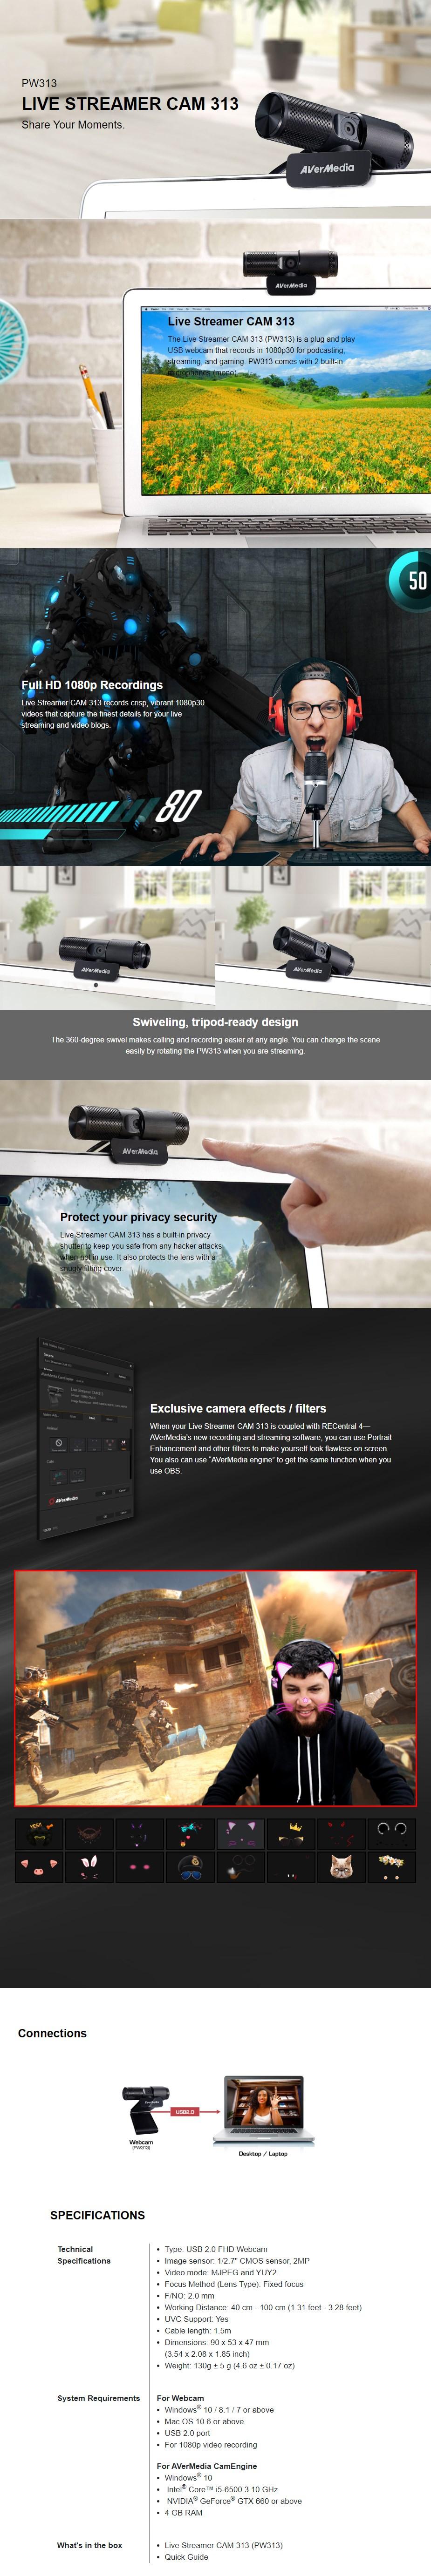 avermedia-live-streamer-cam-313-full-hd-webcam-ac31578.jpg